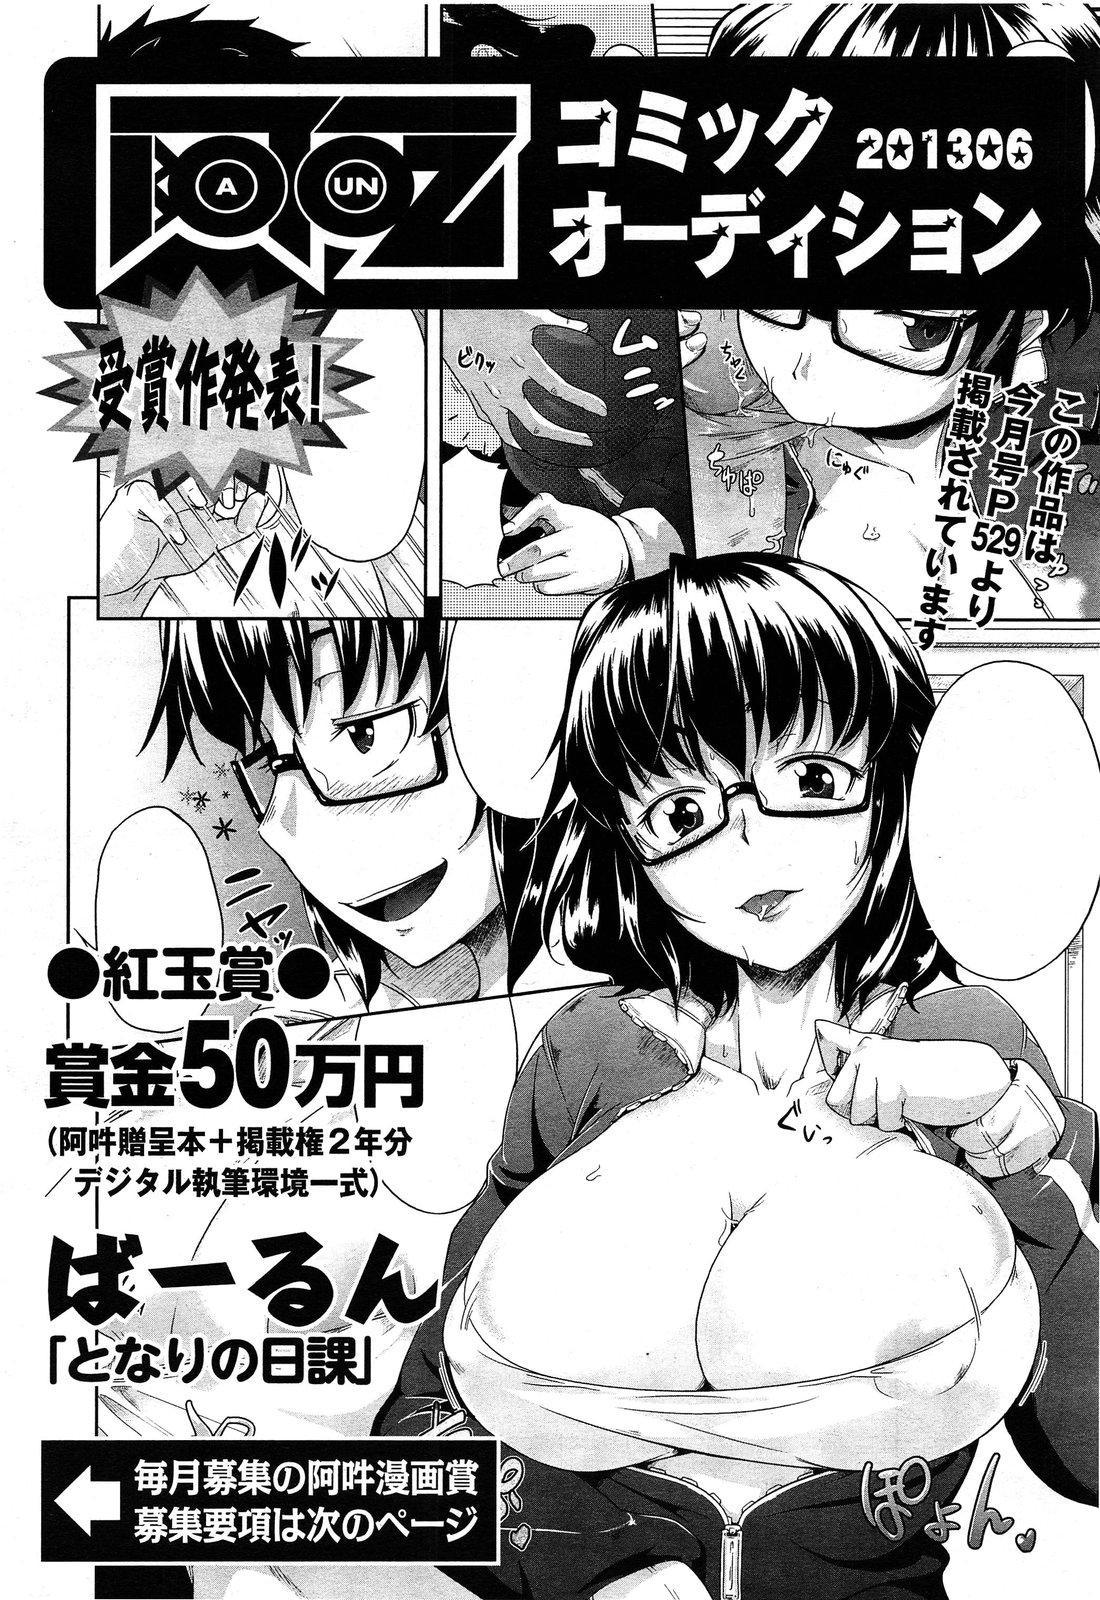 Comic Aun 2013-06 256